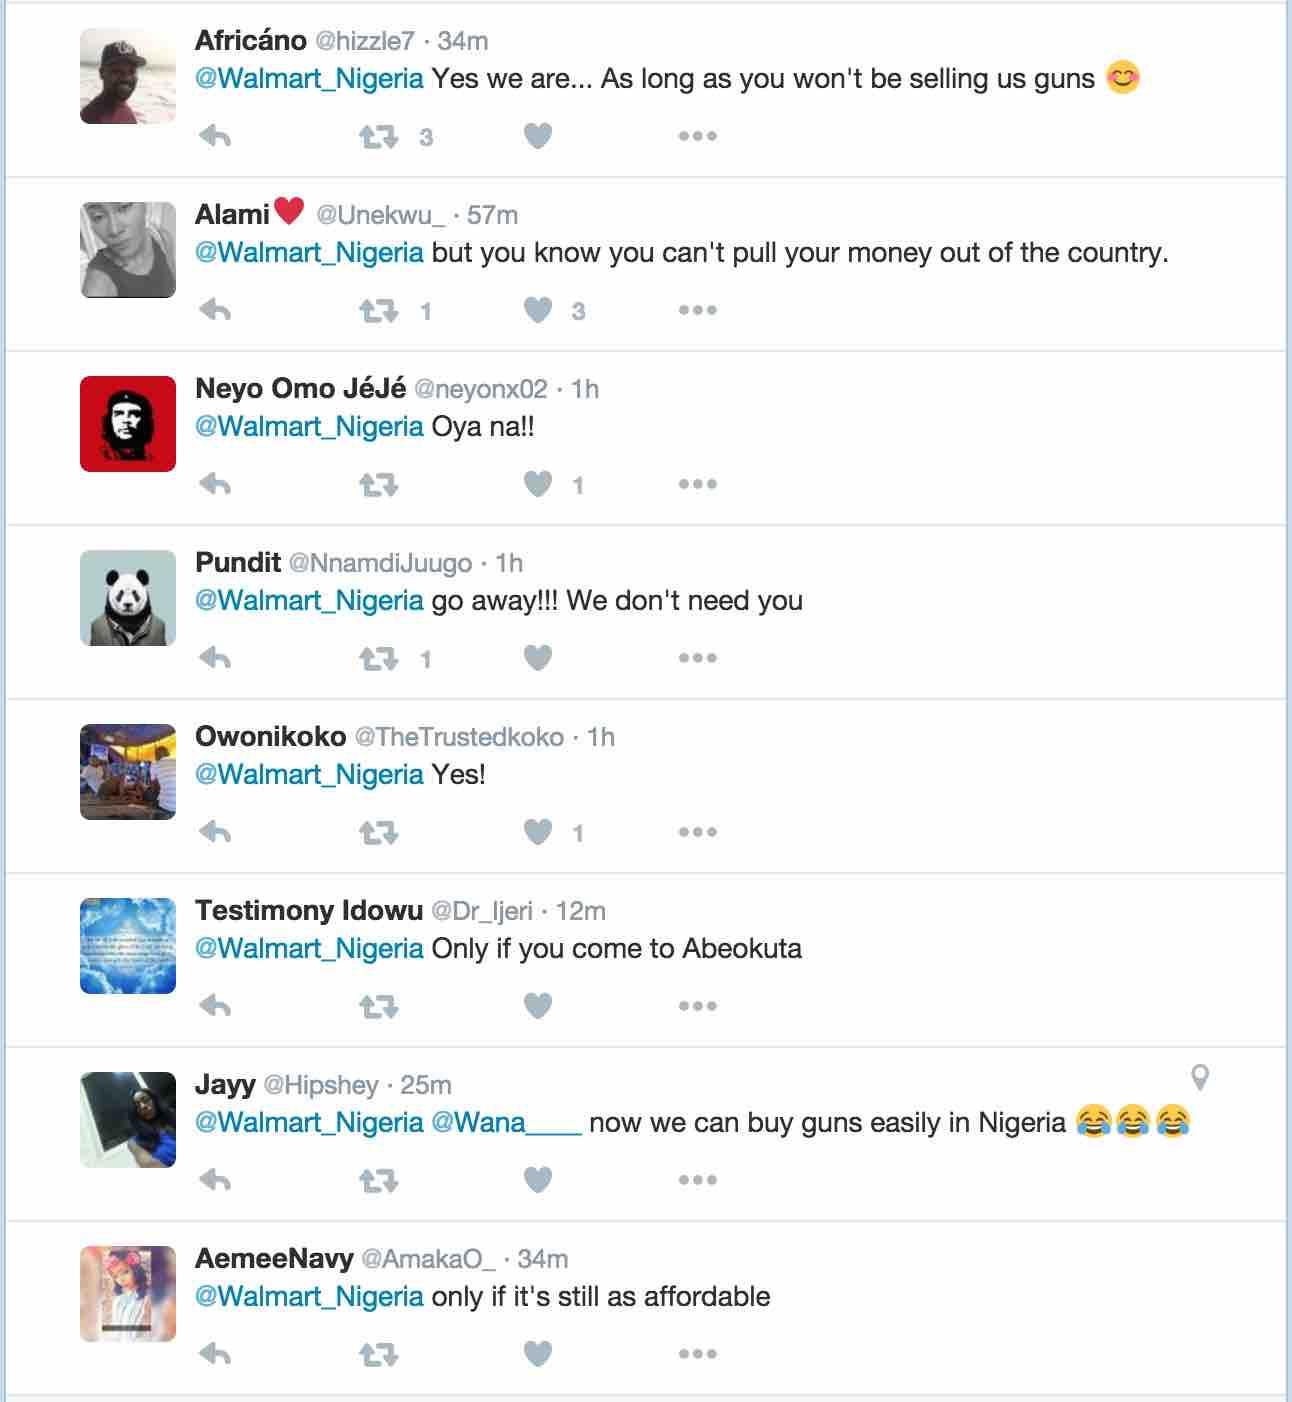 Walmart-Nigeria-twitter